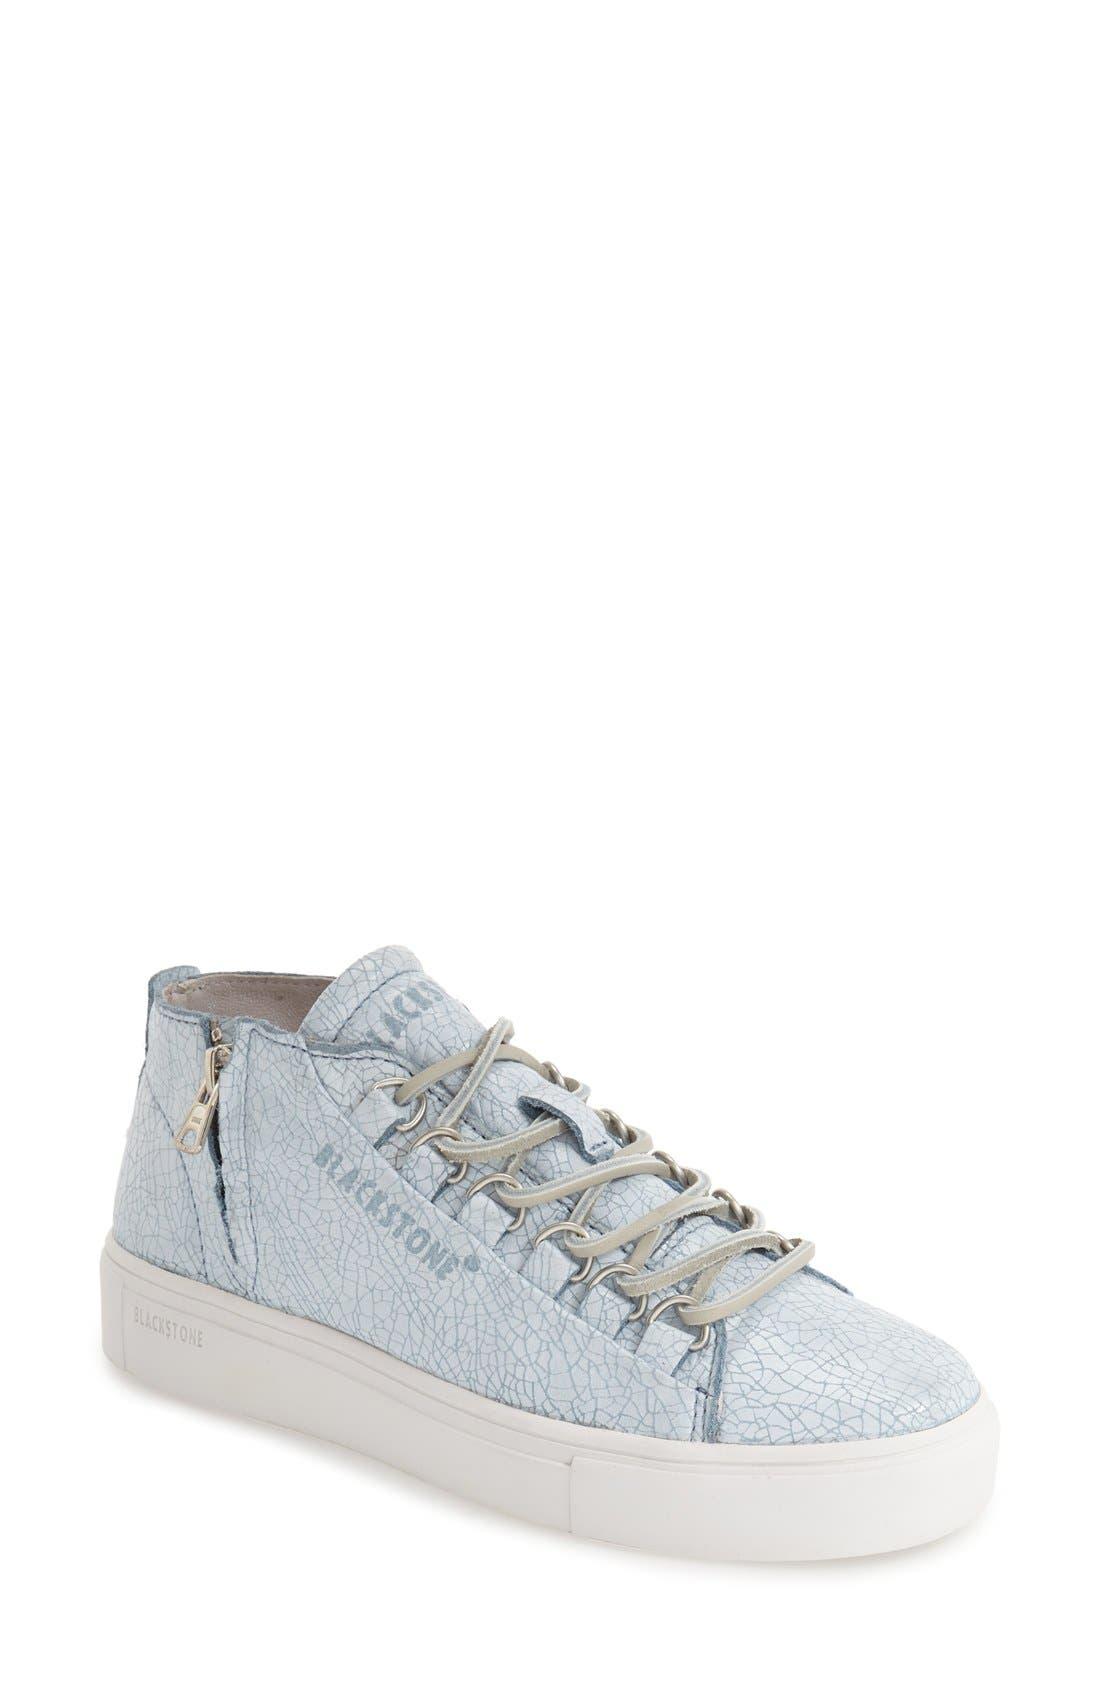 Main Image - Blackstone 'LL60' Midi Sneaker (Women)